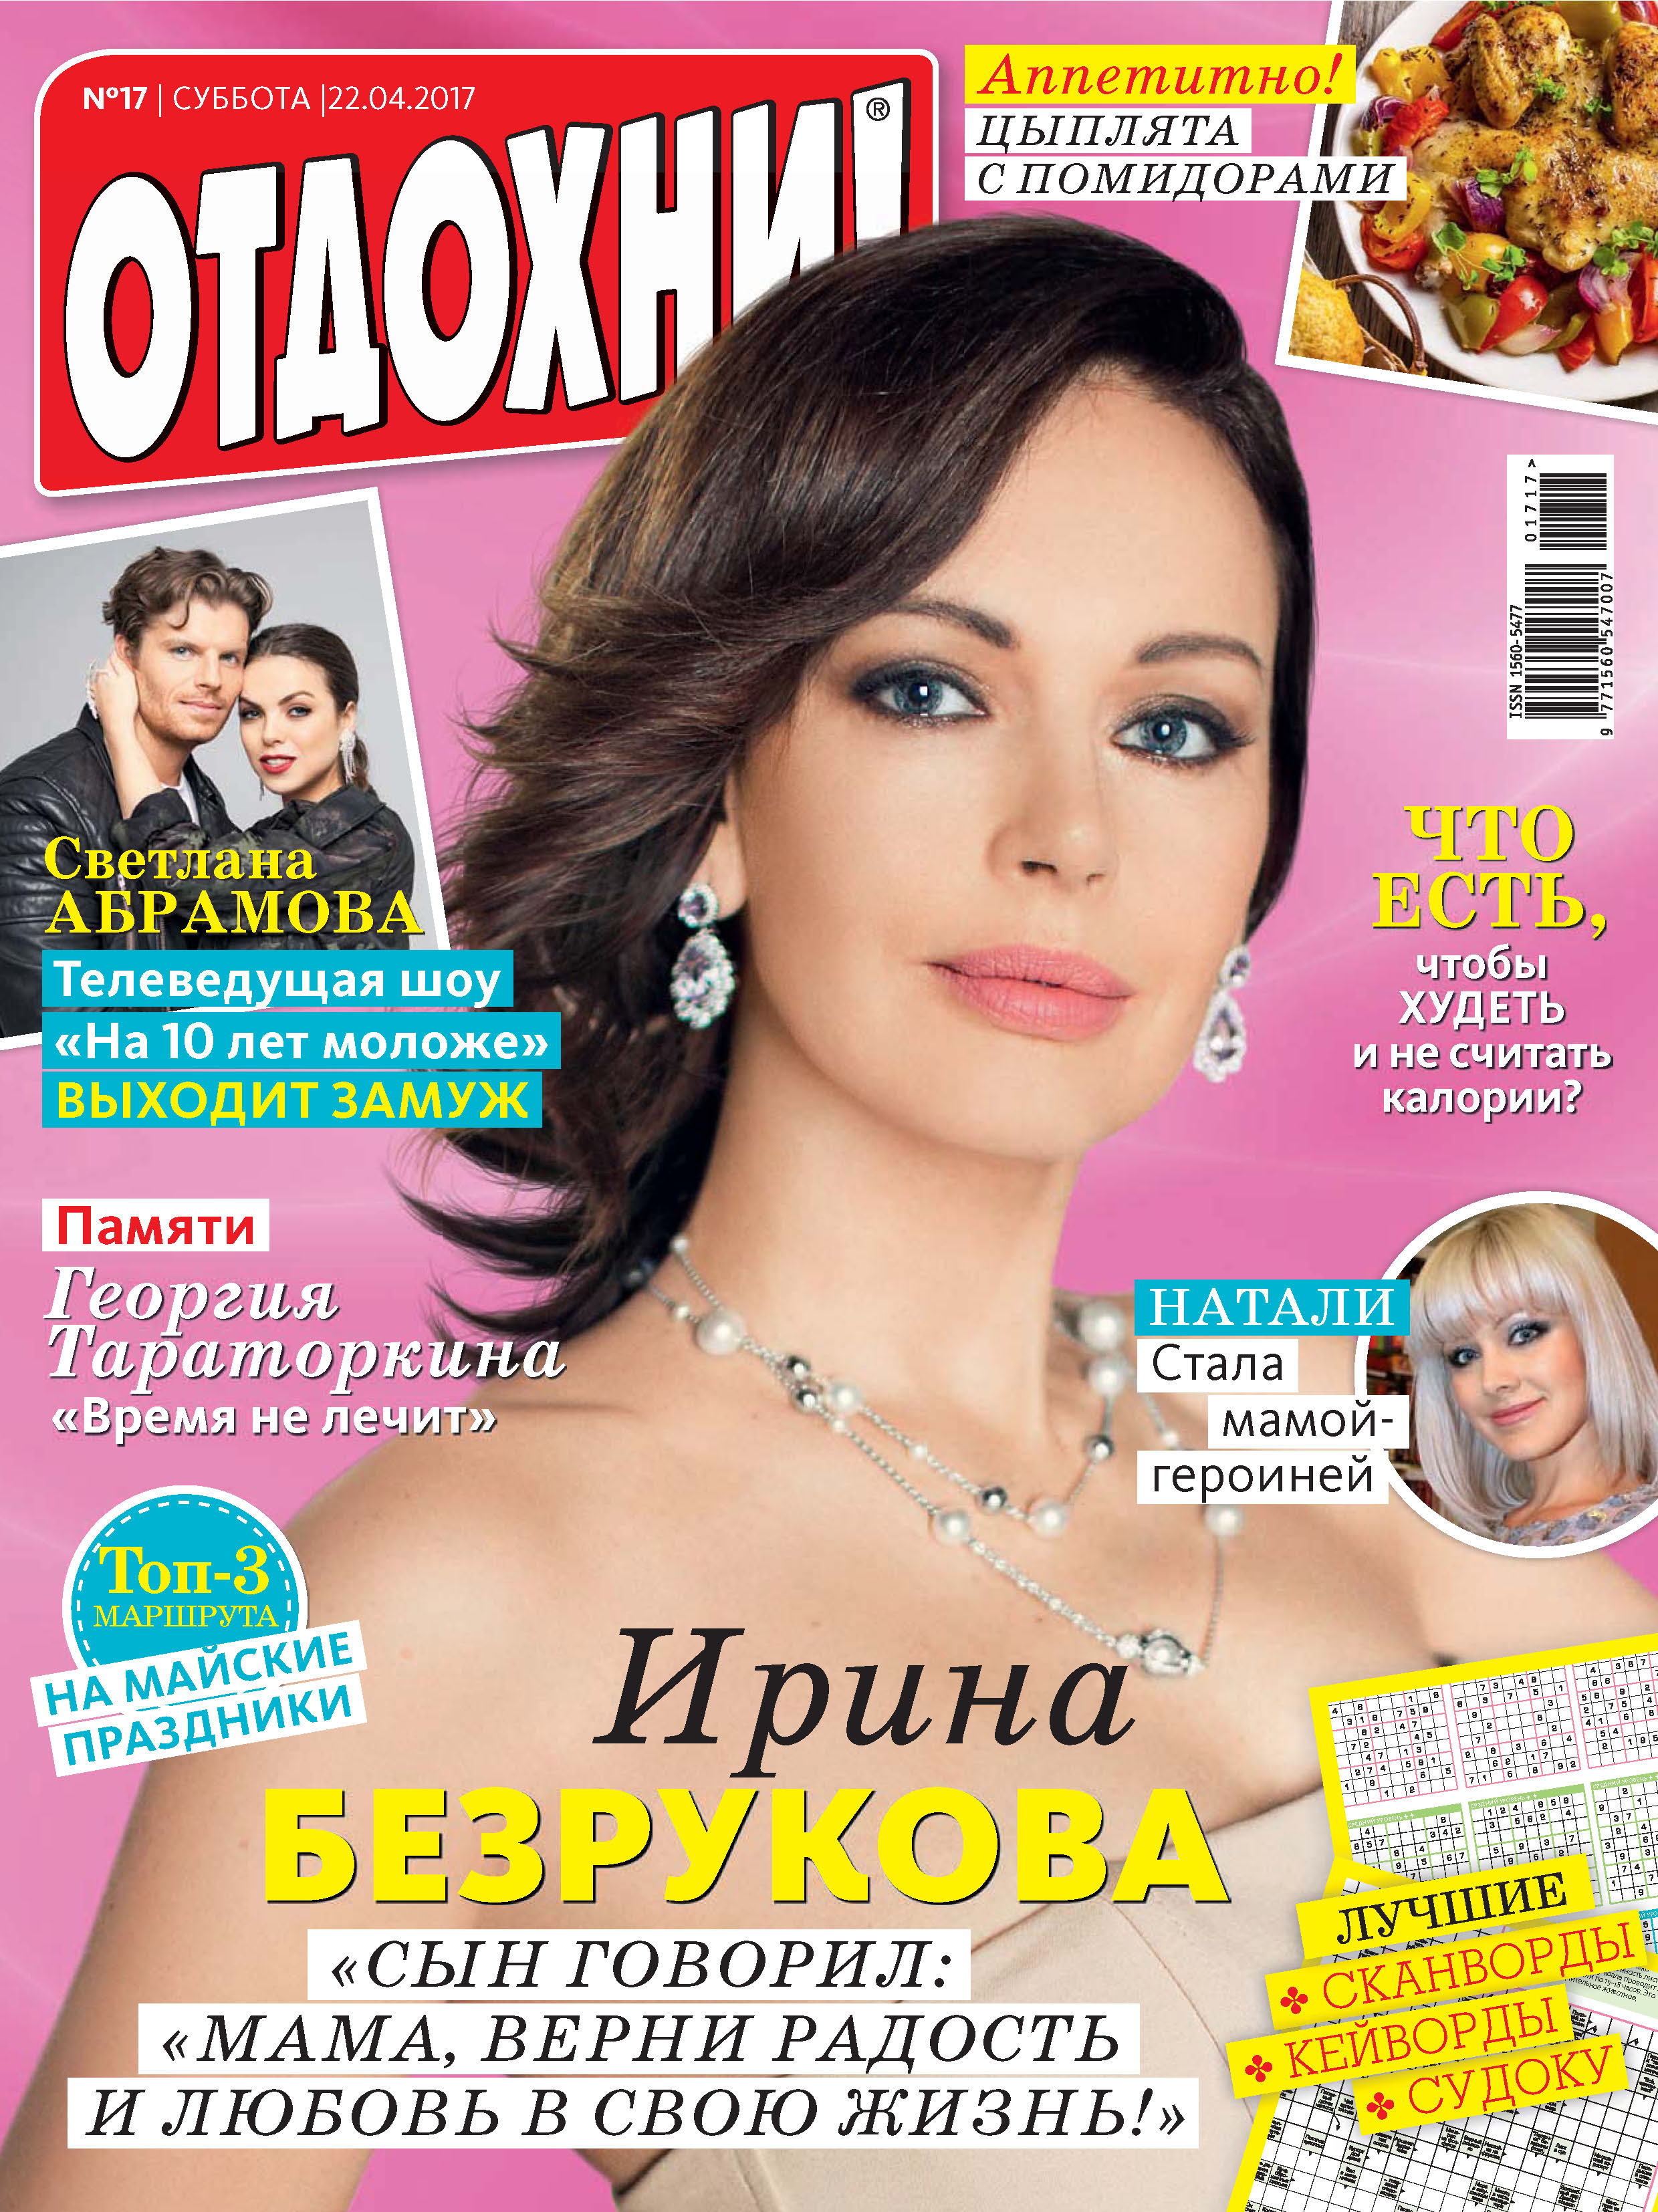 ИД «Бурда» Журнал «Отдохни!» №17/2017 цена